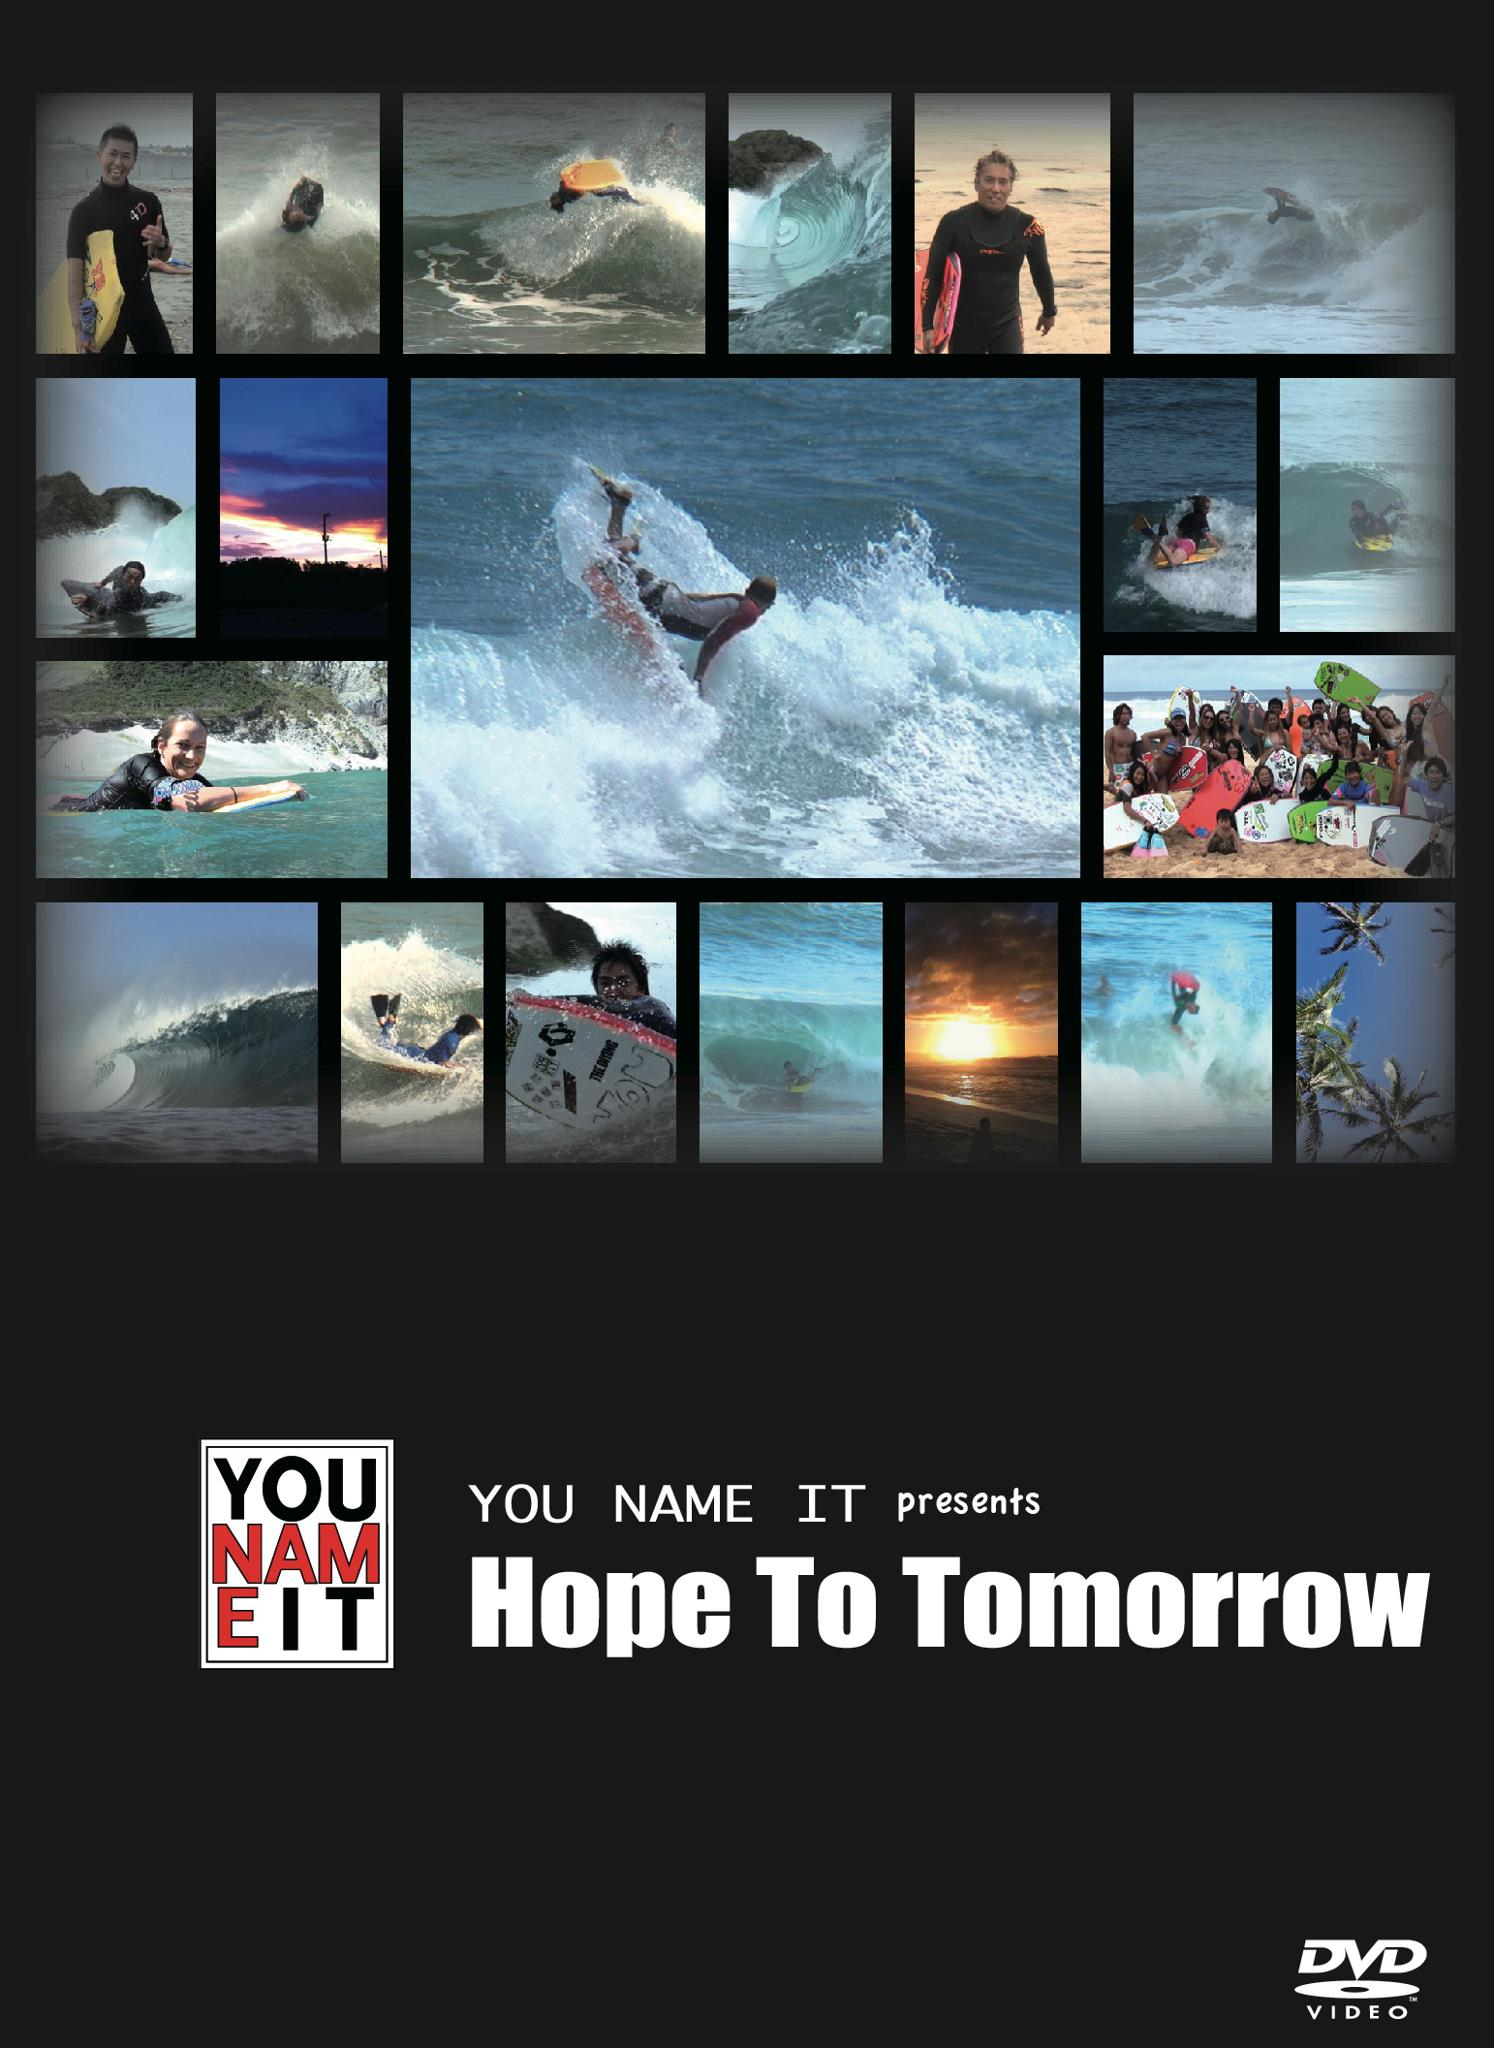 "HOPE TO TOMORROW<br>過去3度のワールドチャンピオンに輝いたダミアン・キングや<br>WOMENSオーストラリアチャンピオンのリリー・ポラードが日本の波での貴重なライディングは必見。<br>榎戸崇人プロ、大原沙莉プロに加え世界で活躍する日本人のトッププロの繰り出すスピン、エルロロ、ARSなどの高度なテクニックはまさに世界基準!!<br>身近な日本での映像を多く使用することでイメージトレーニングに最適です。<br>大迫力な水中撮影でのライディング映像を数多く収録!! <br>これまでにないボディボードの楽しさを充分に味わうことの出来る作品です。<br><br>【<a href=""http://www.youtube.com/user/yntpro#p/u/0/7RHmz8wkspQ"">動画サンプルはコチラ!</a>】<br>"